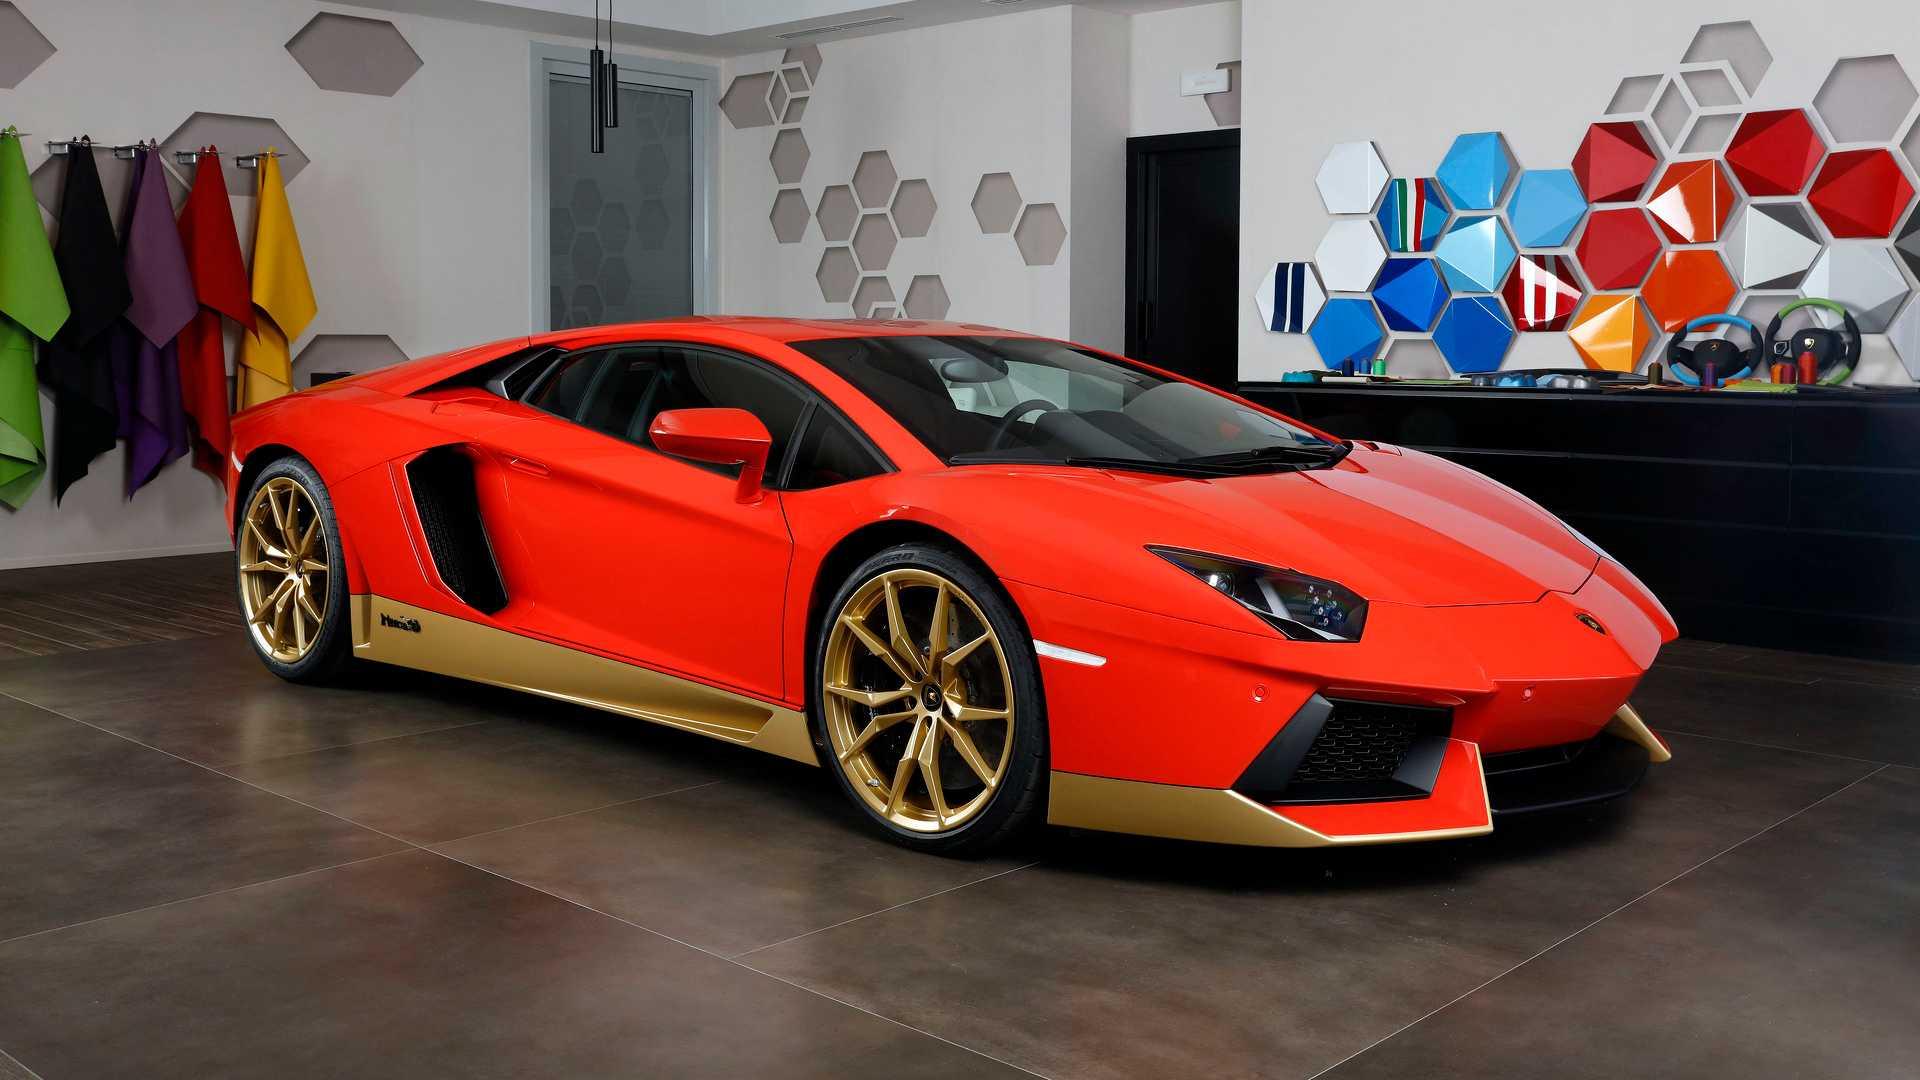 Lamborghini Miura Homage Celebrates The Brand S Super Cars